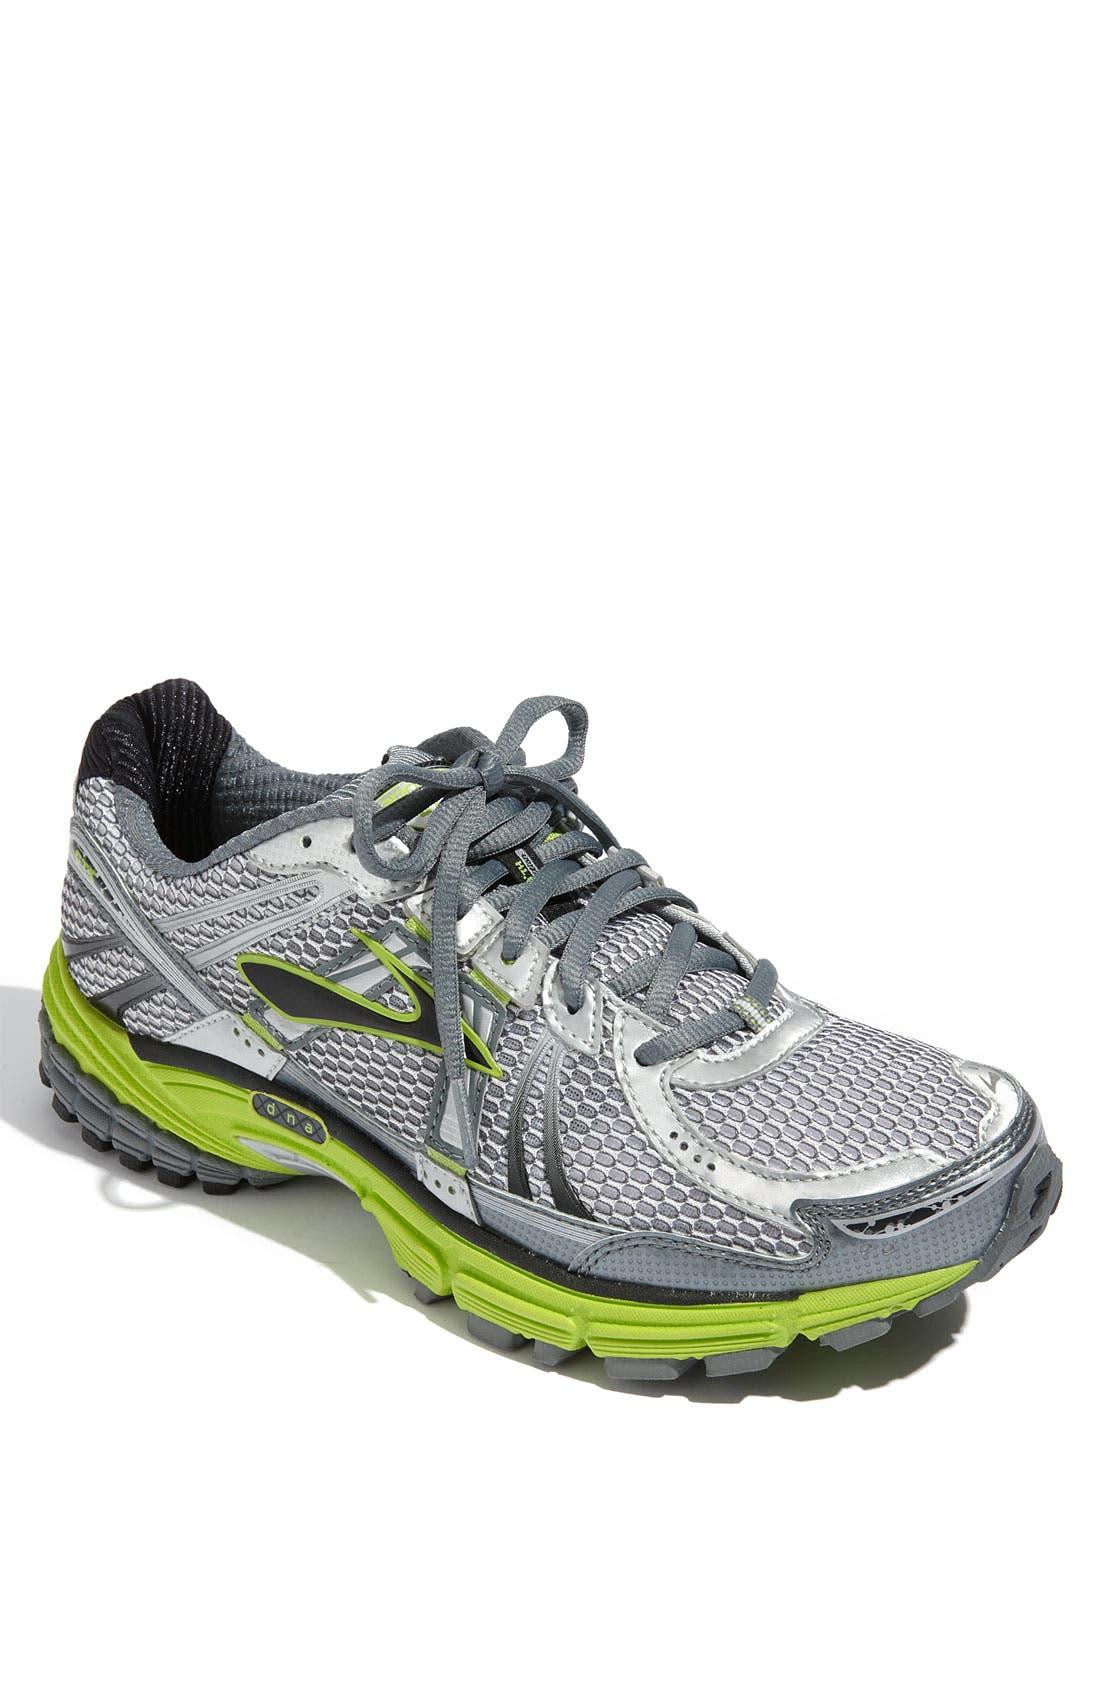 Alternate Image 1 Selected - Brooks 'Adrenaline GTS 12' Running Shoe (Men)